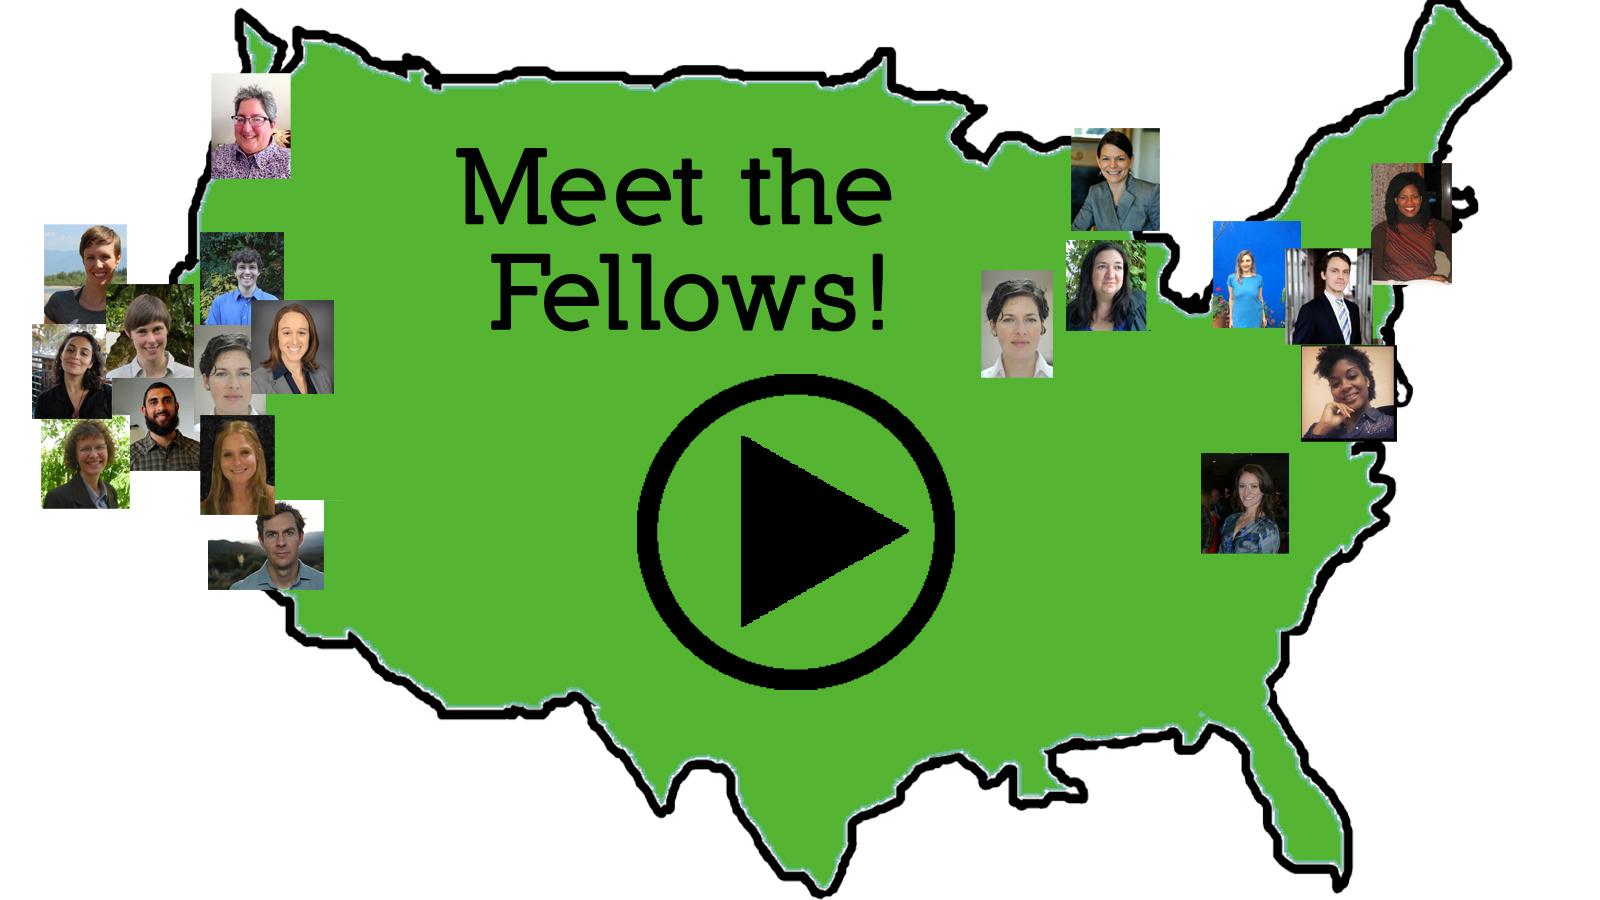 Meet the Fellows